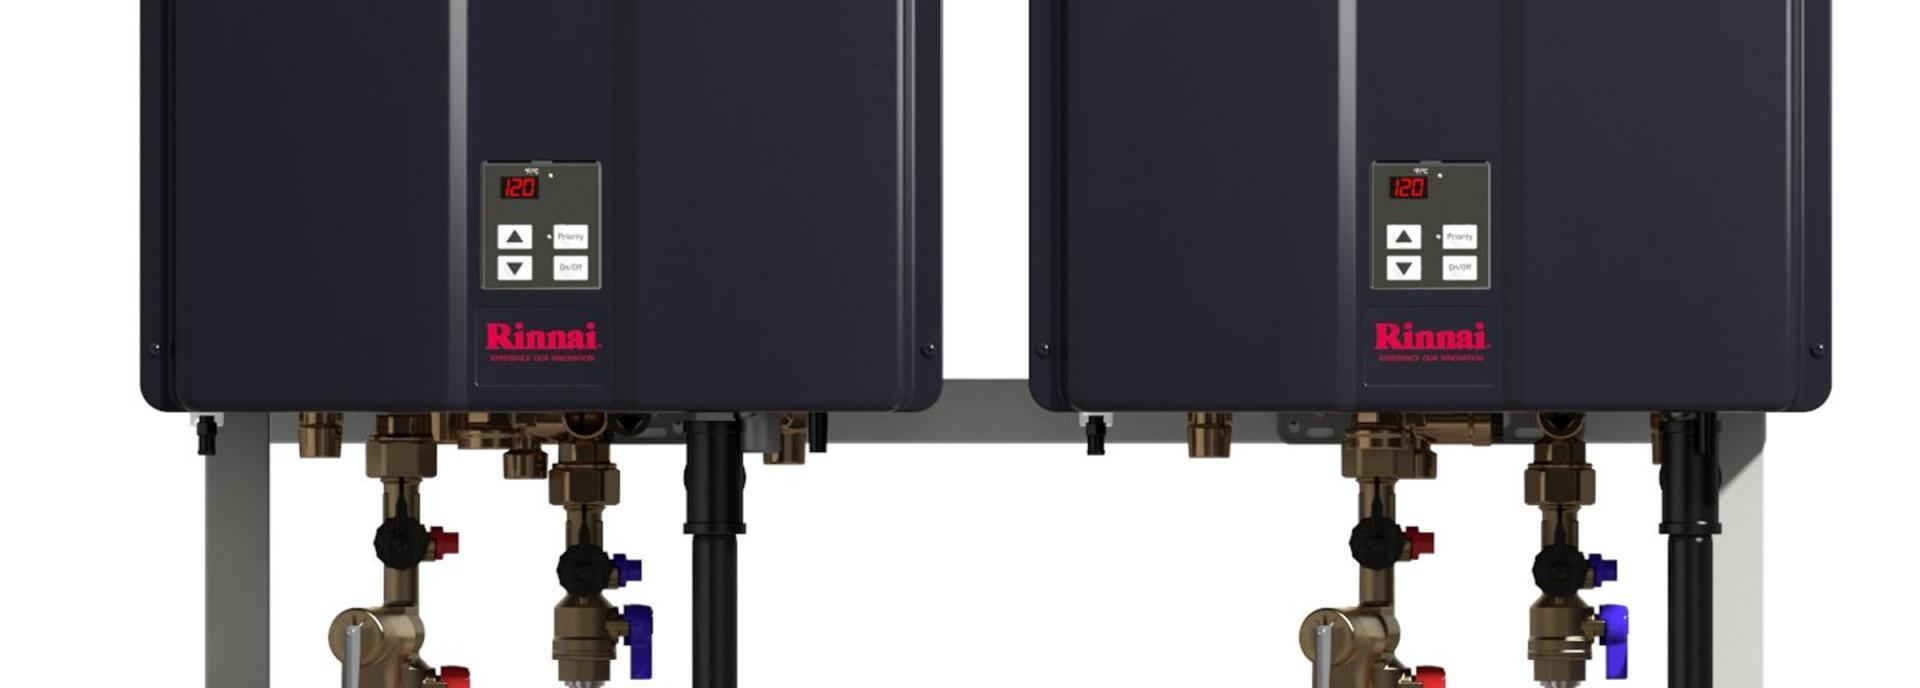 small resolution of cu199 models rinnai america cu199 models rinnai boilers wiring diagram